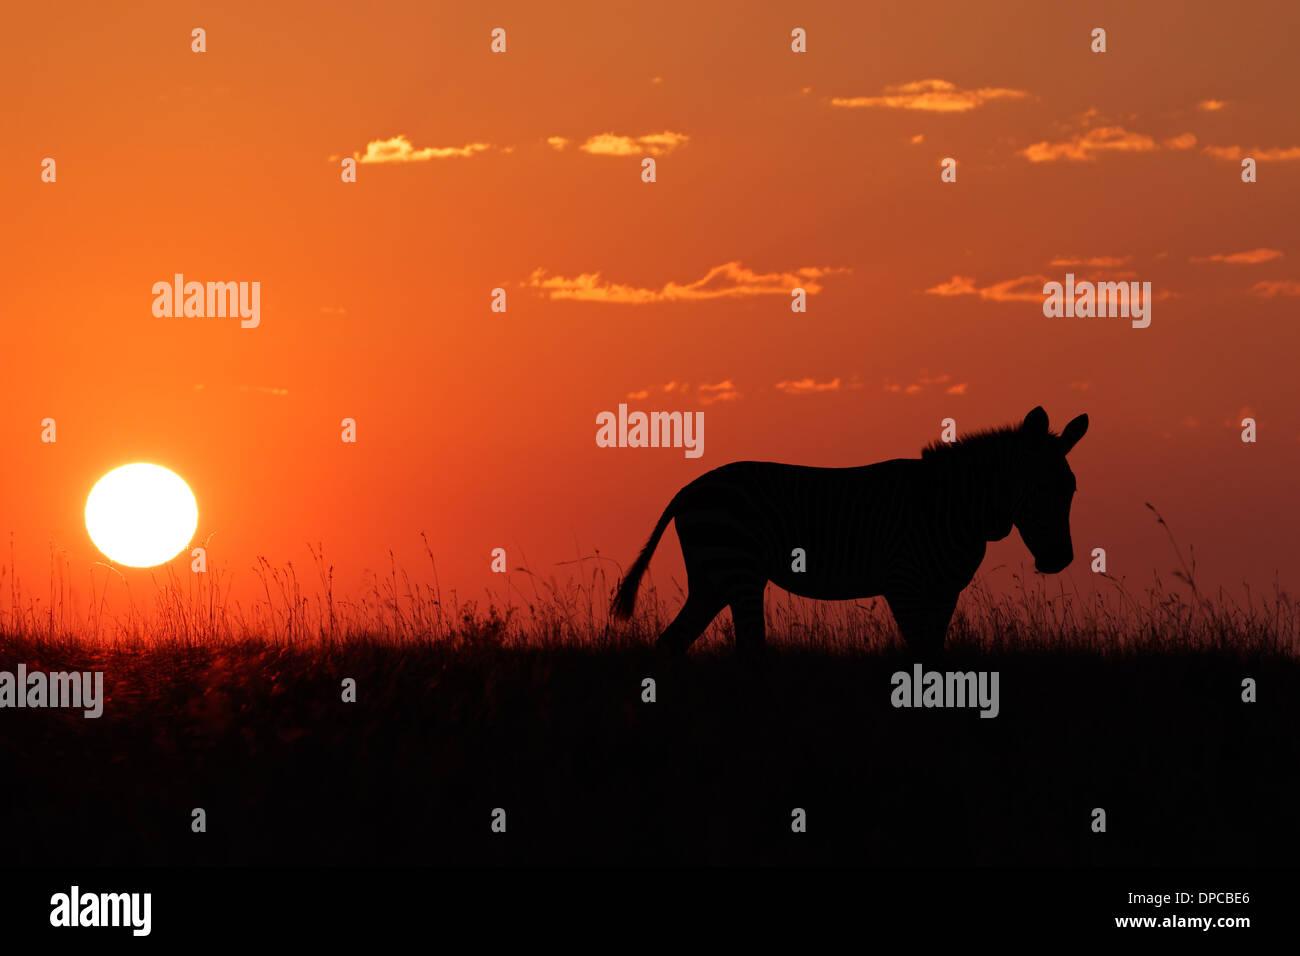 Kap-Bergzebra (Equus Zebra) gegen einen roten Sonnenaufgang, Südafrika Stockbild